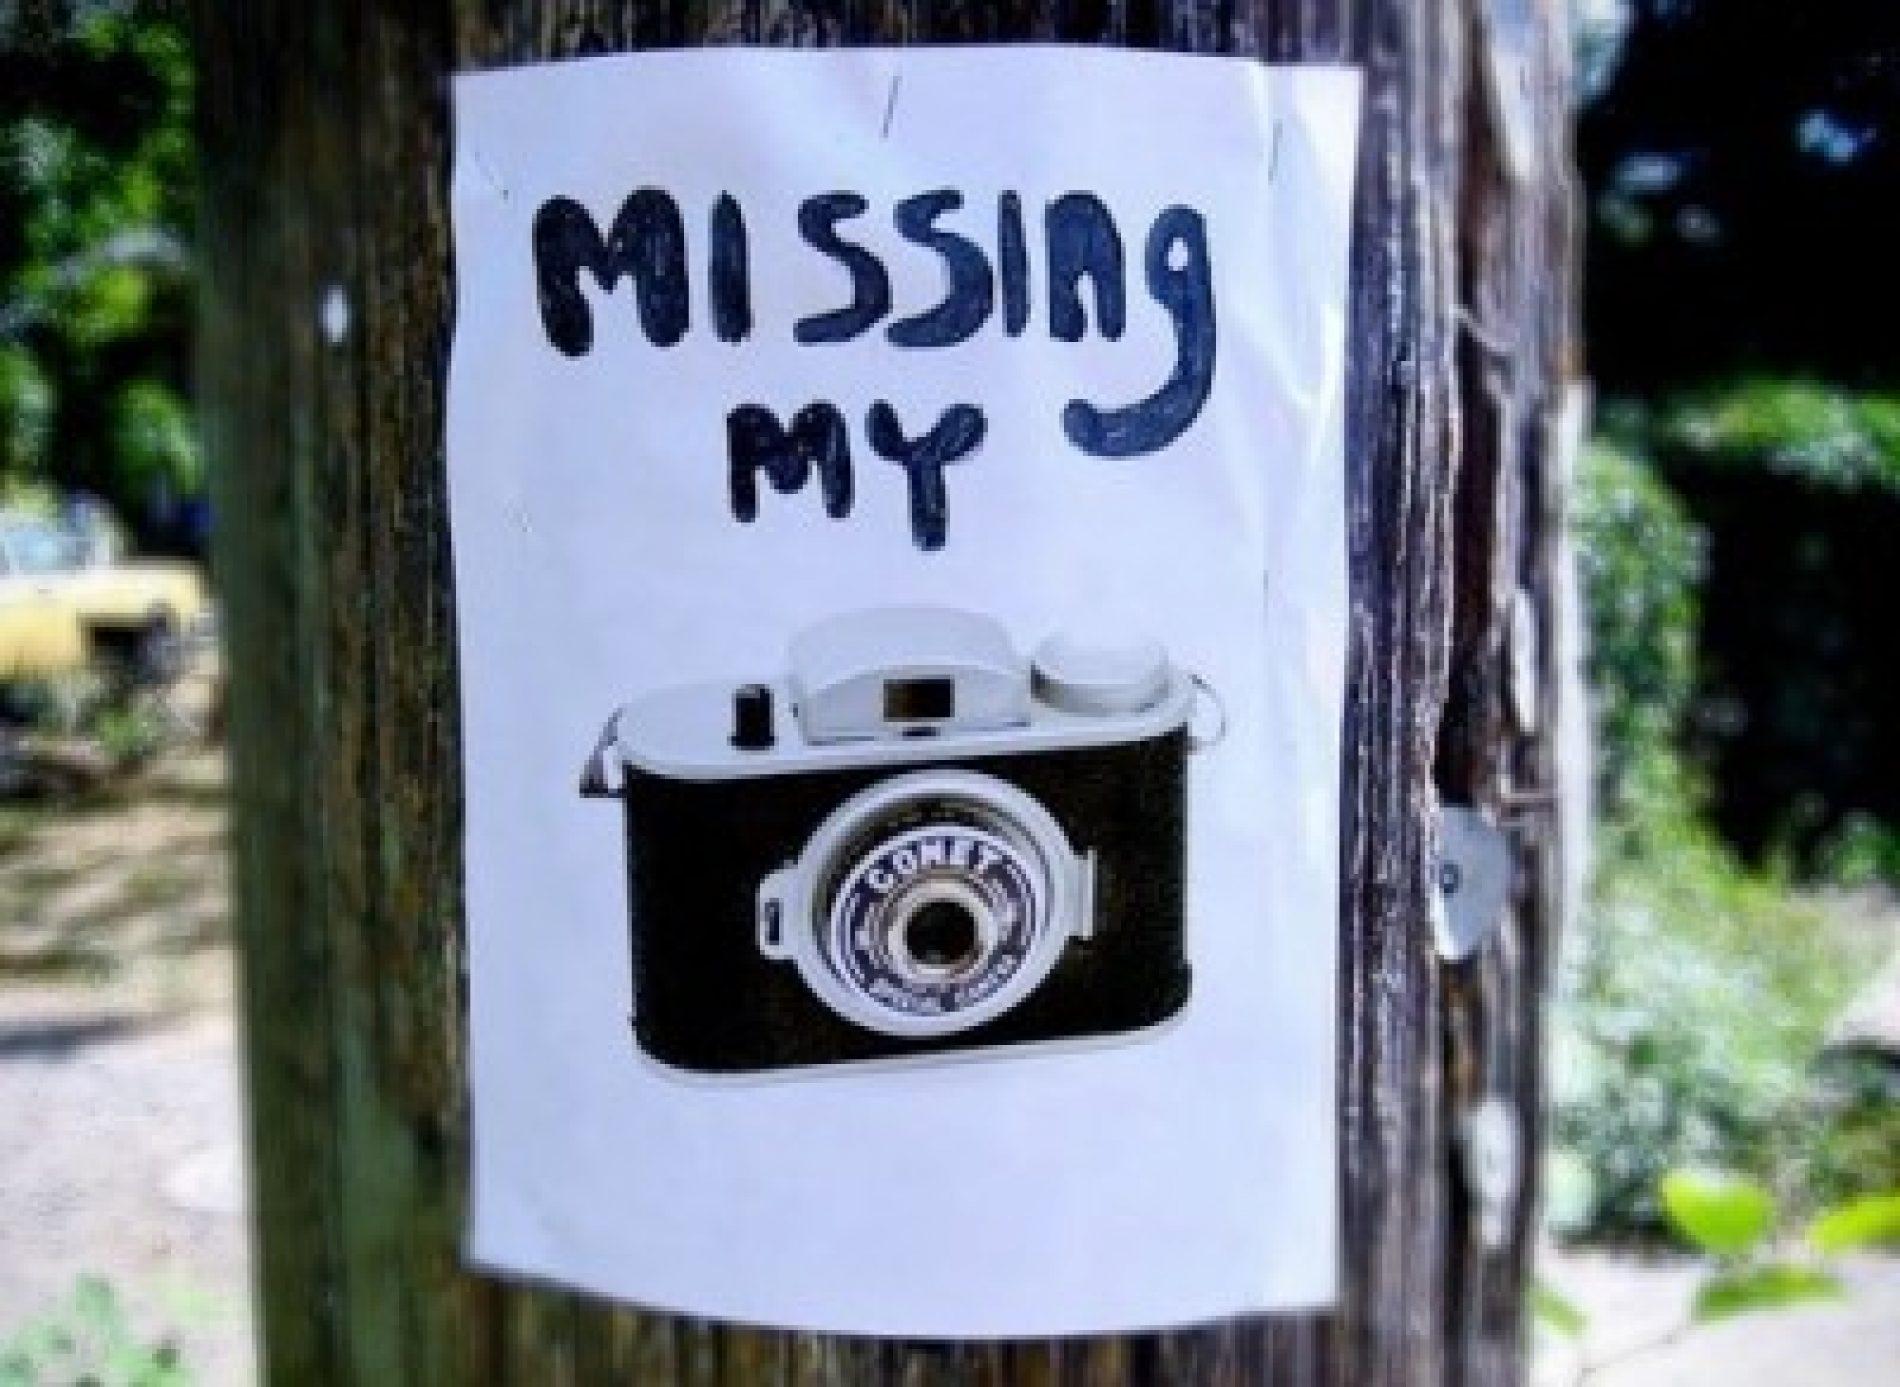 ¿Dónde está mi cámara robada?